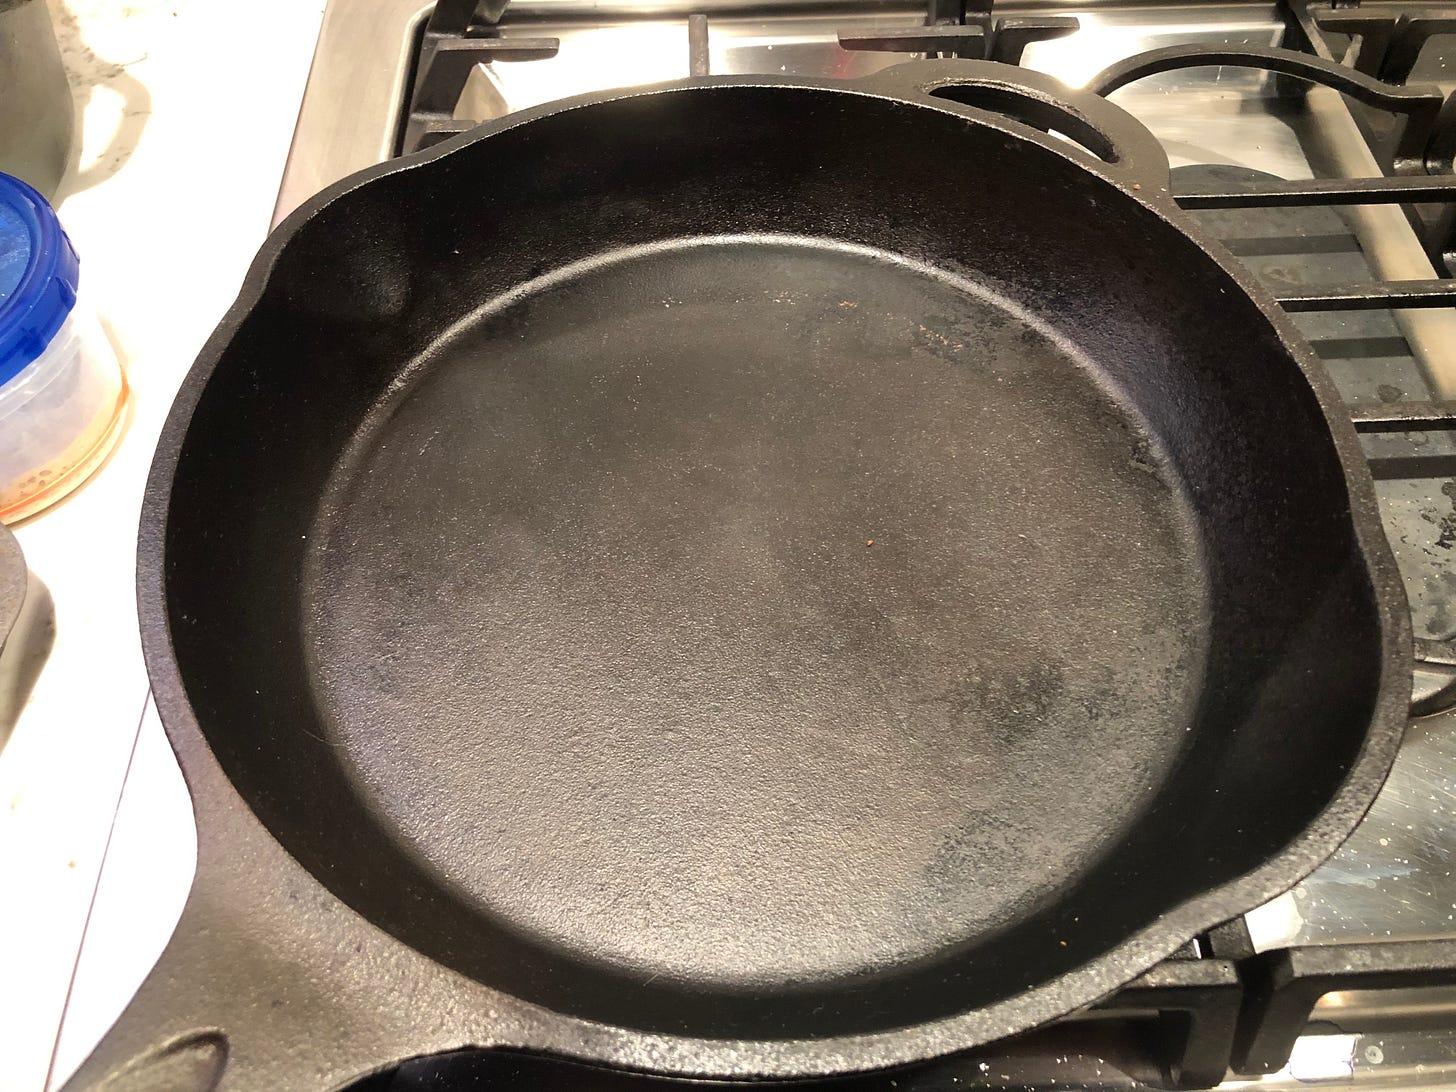 A well-seasoned cast iron pan